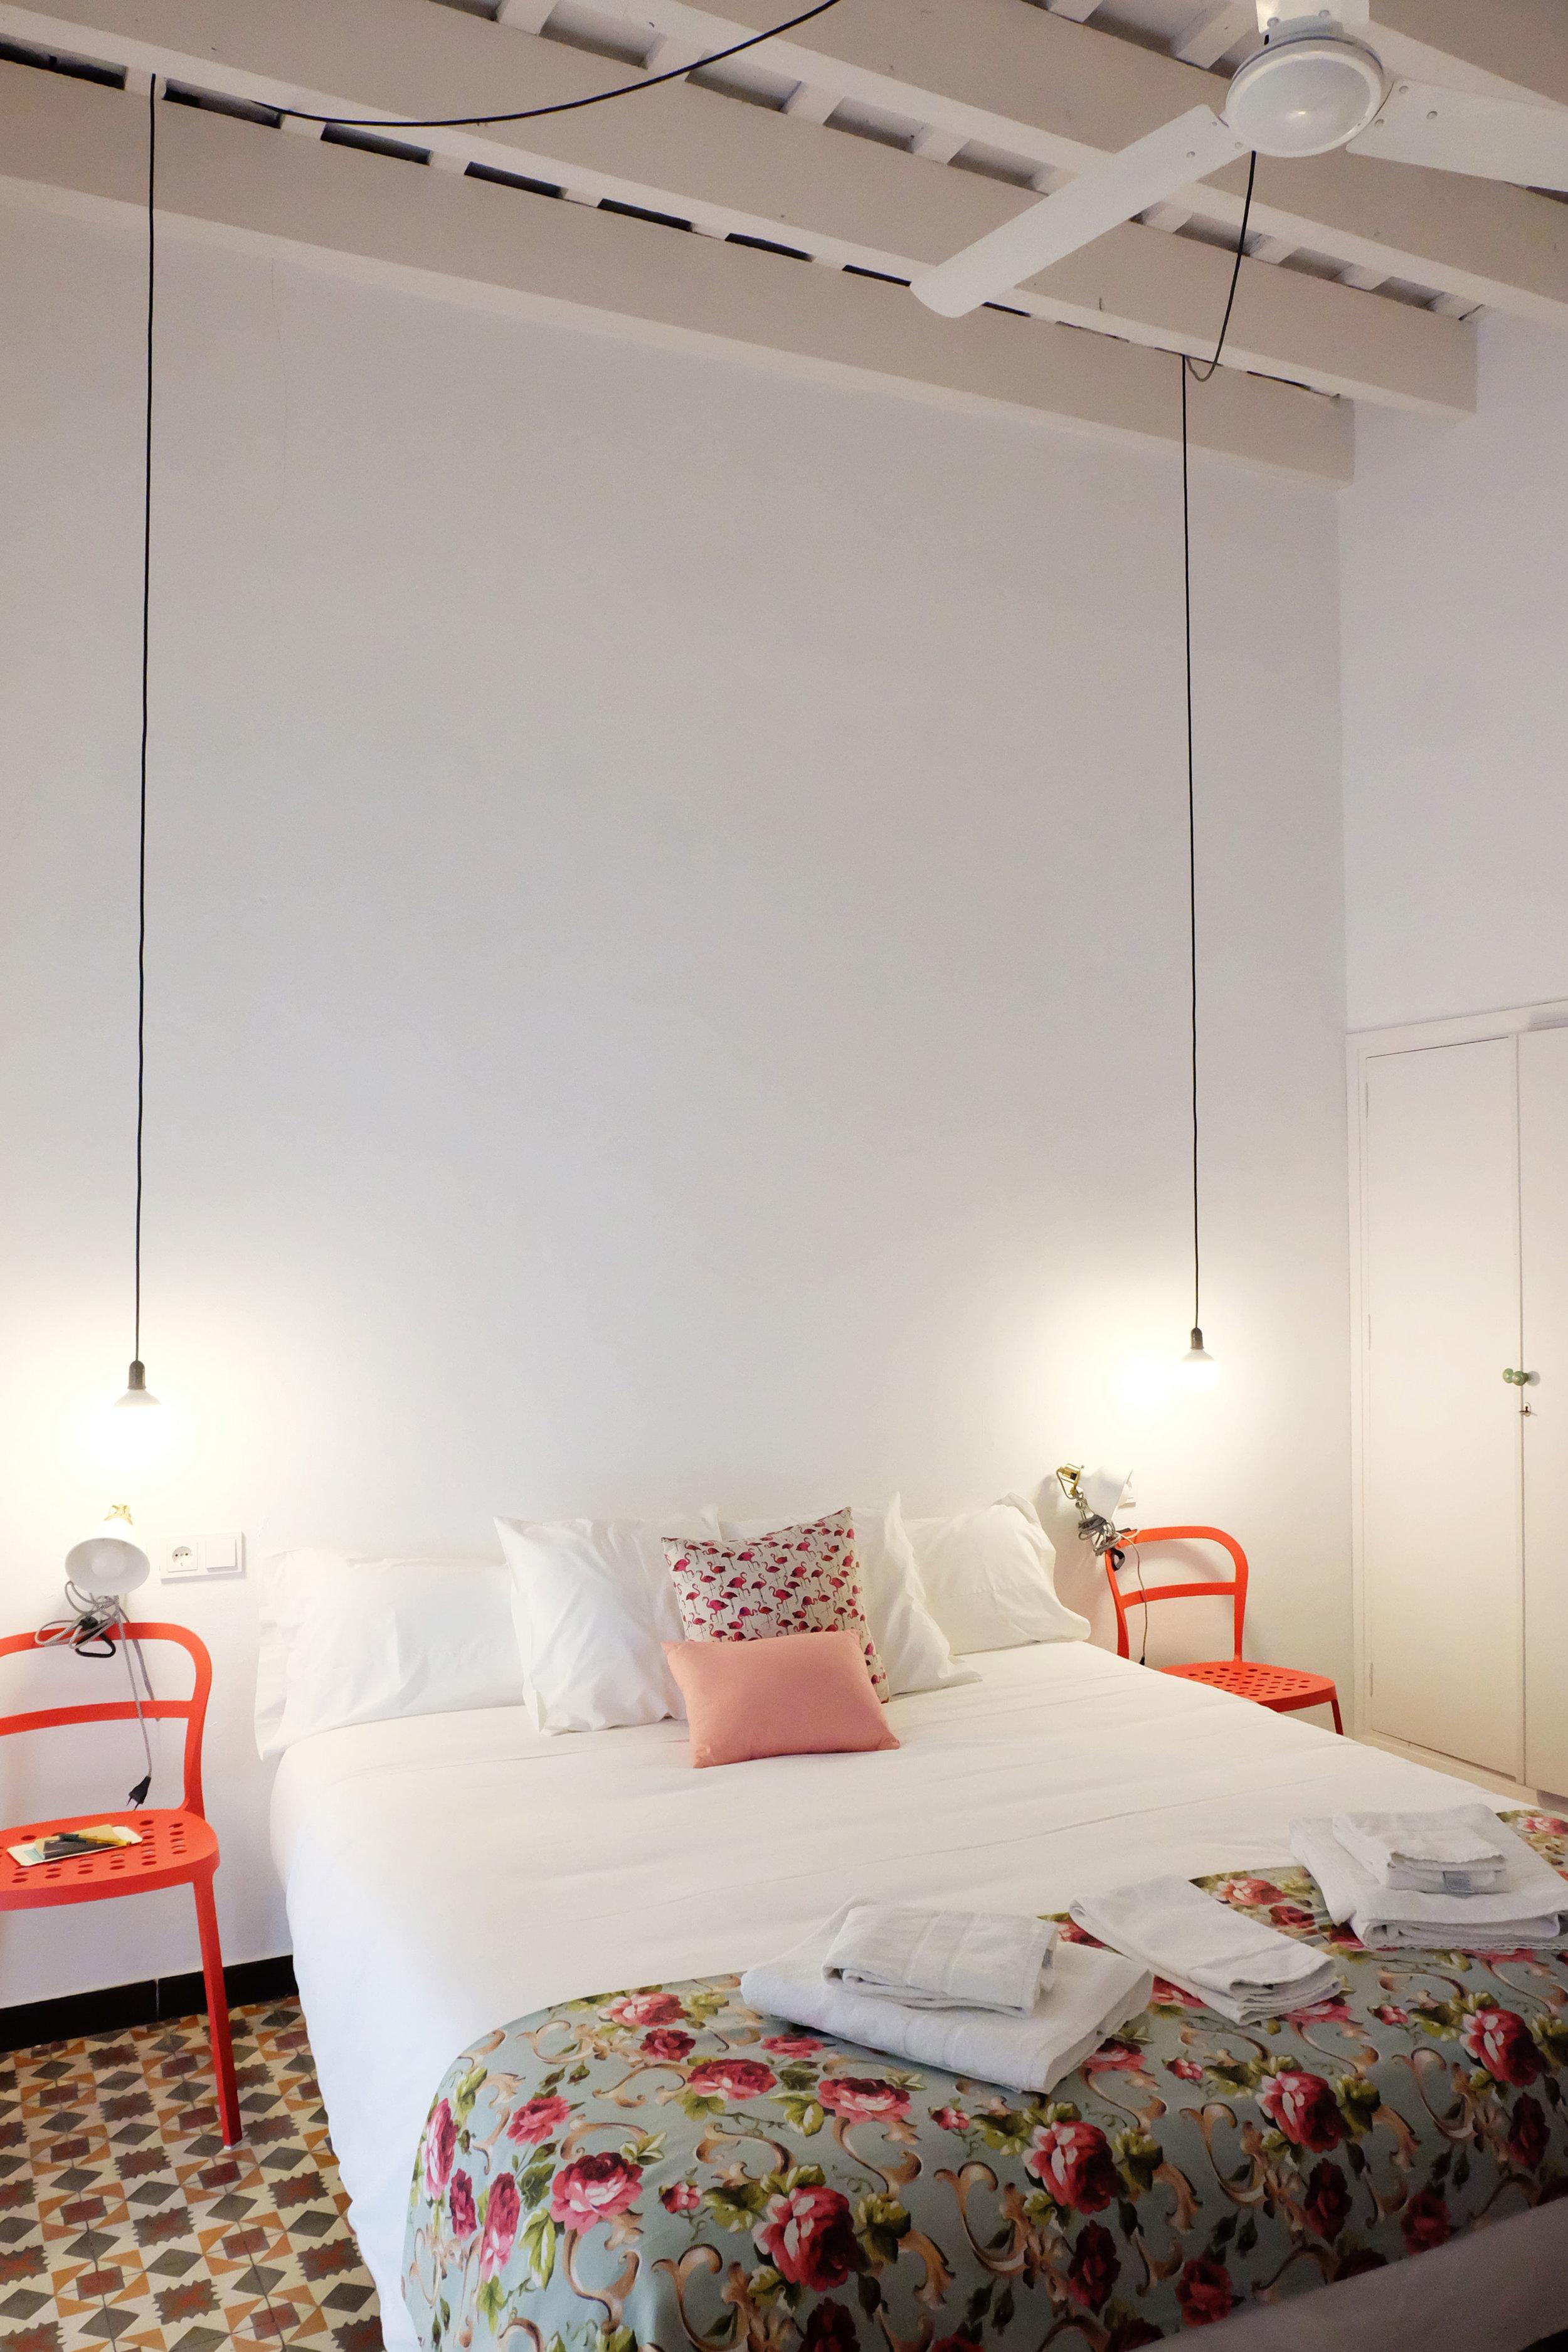 Hotel-Casa-de-huespedes-santa-maria-Habitacion-7-19.jpg